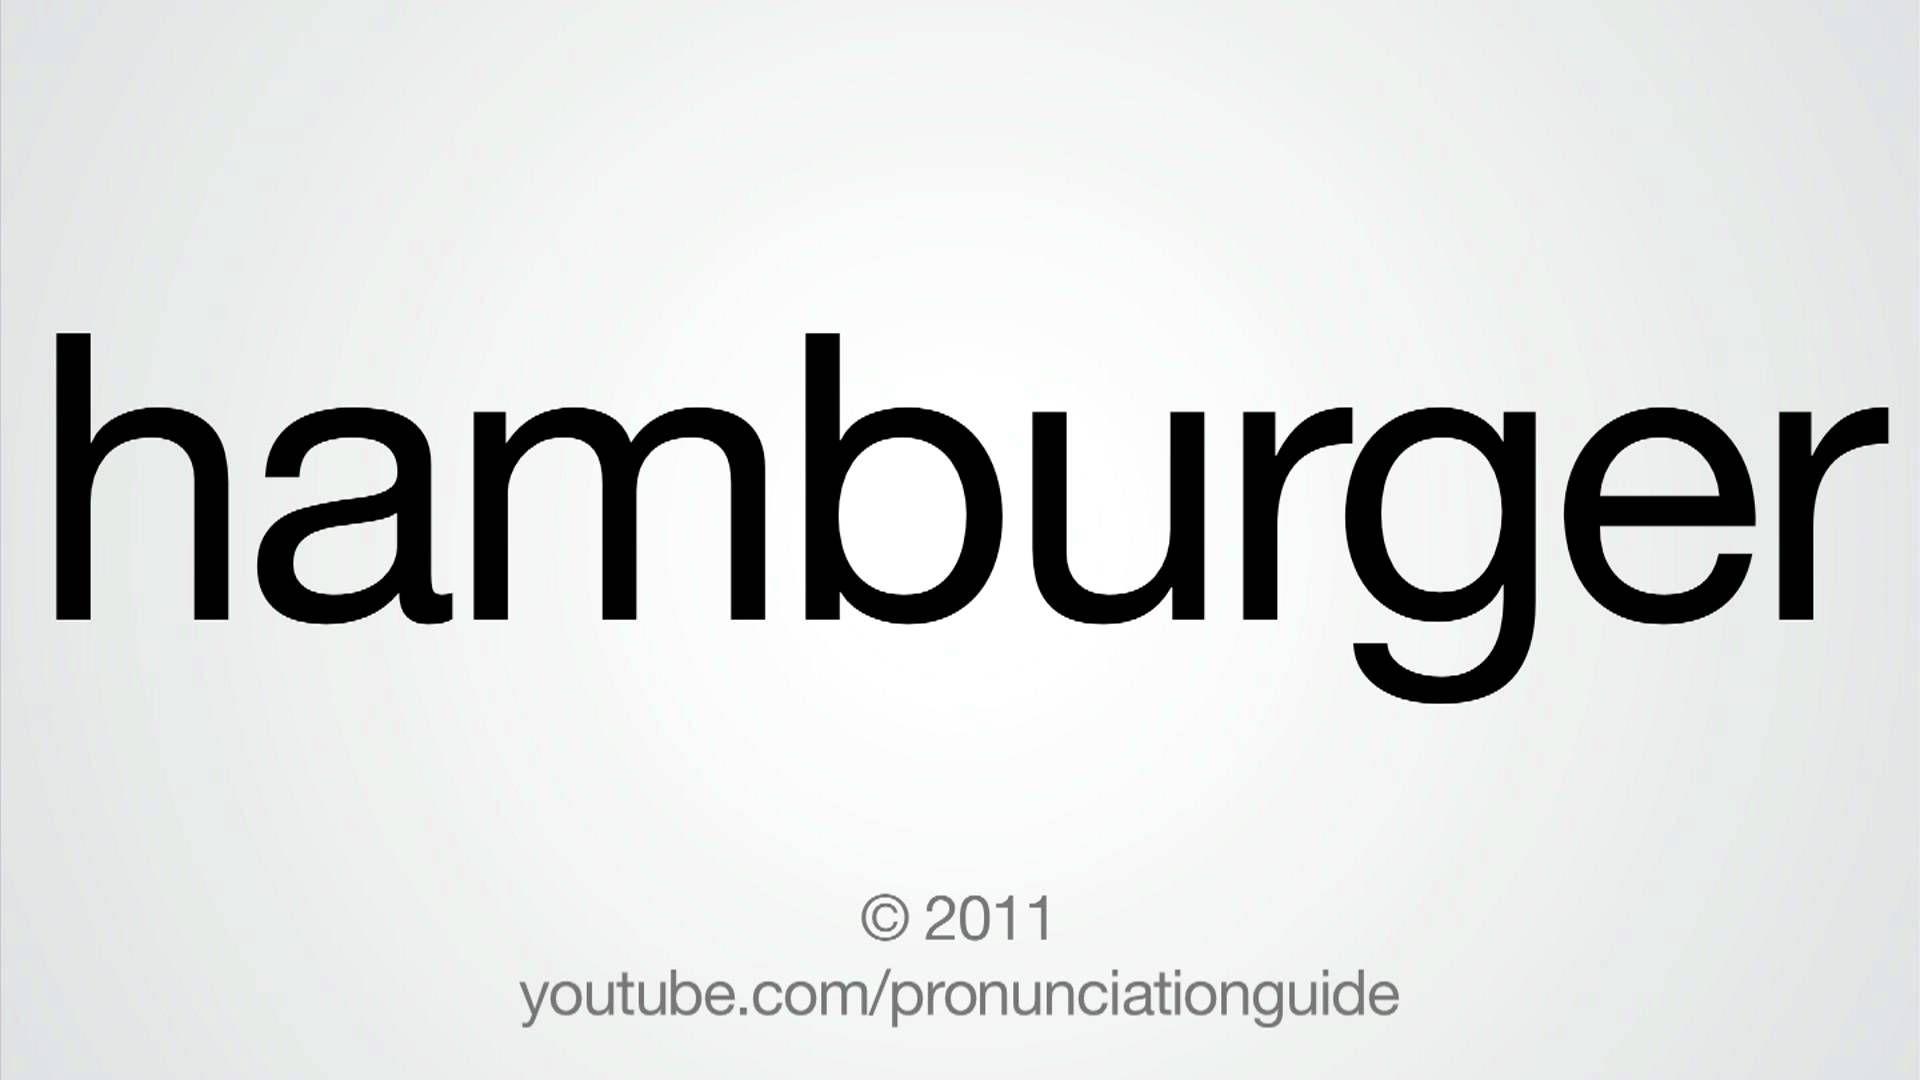 How To Pronounce Hamburger Https Www Youtube Com Watch V Luvu0bftmh8 How To Pronounce Humor Sayings